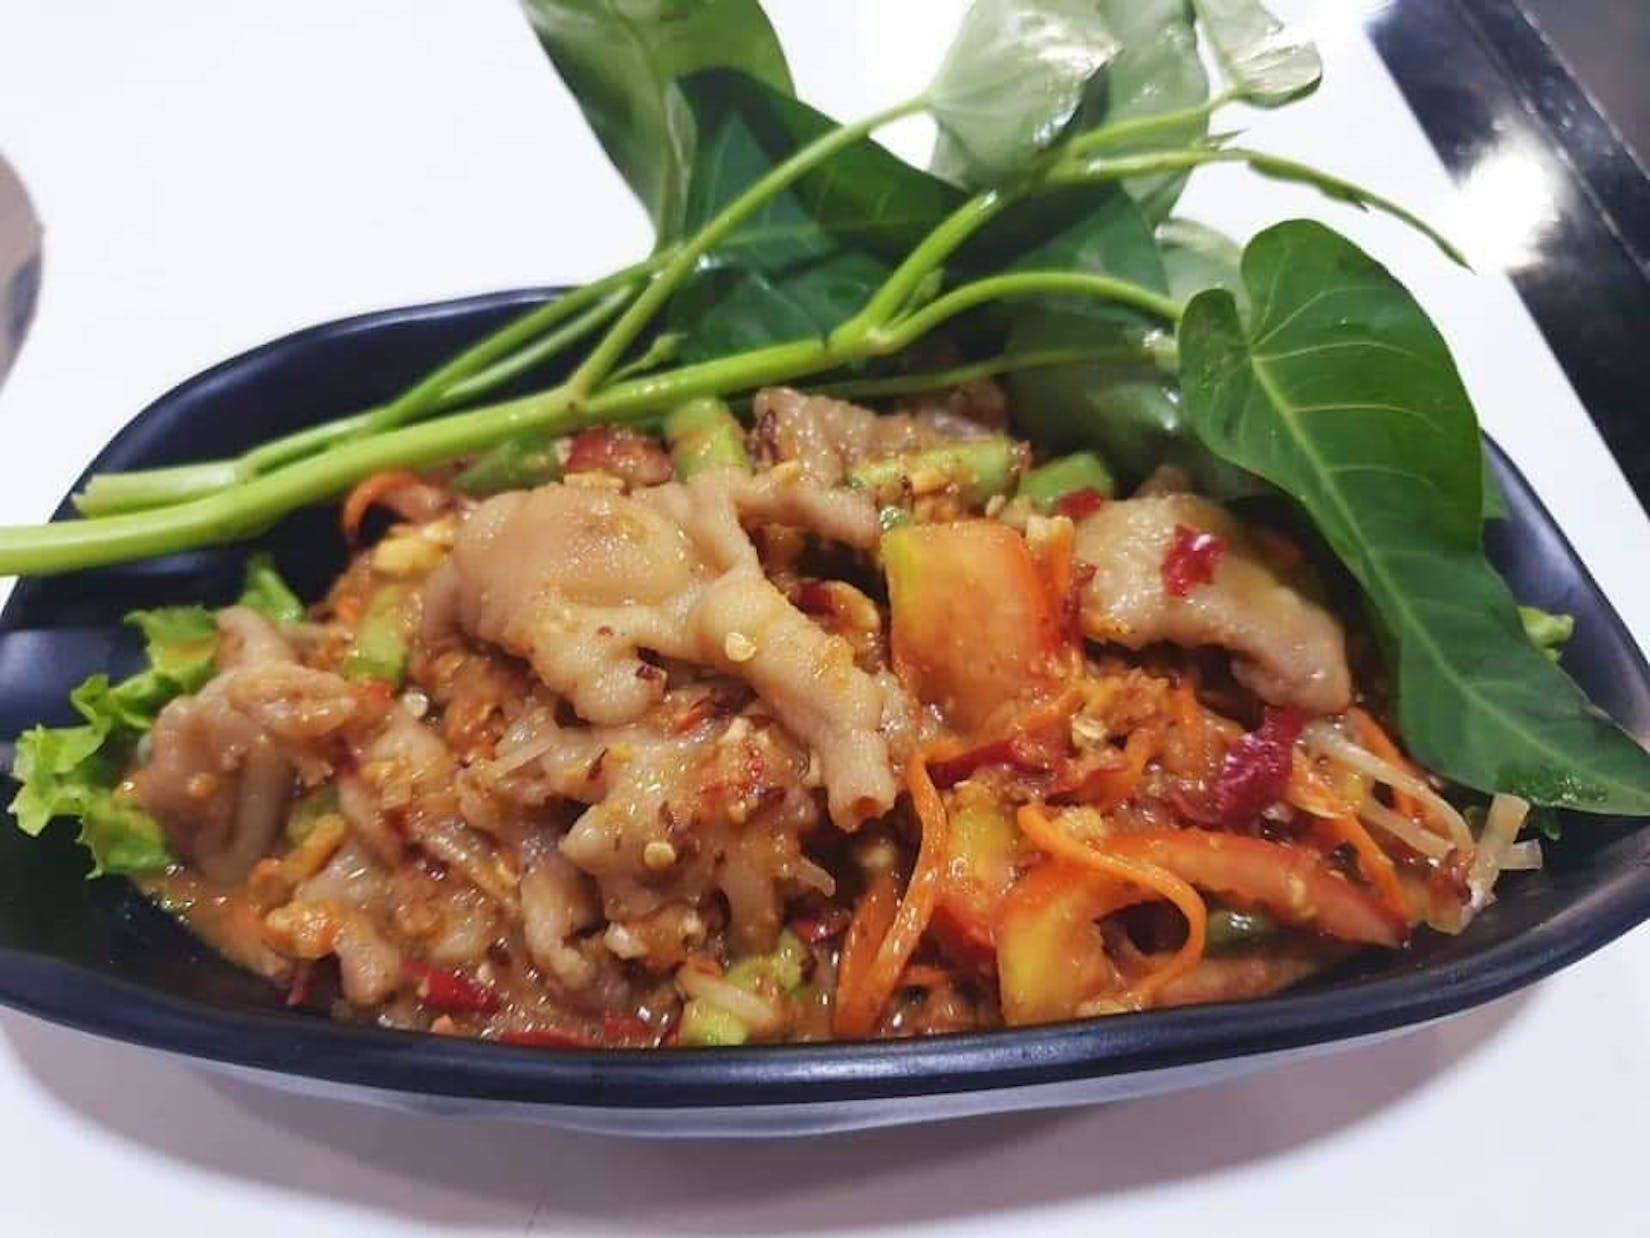 Yatha Stick Hotpot & Mala Xiang Gou | yathar